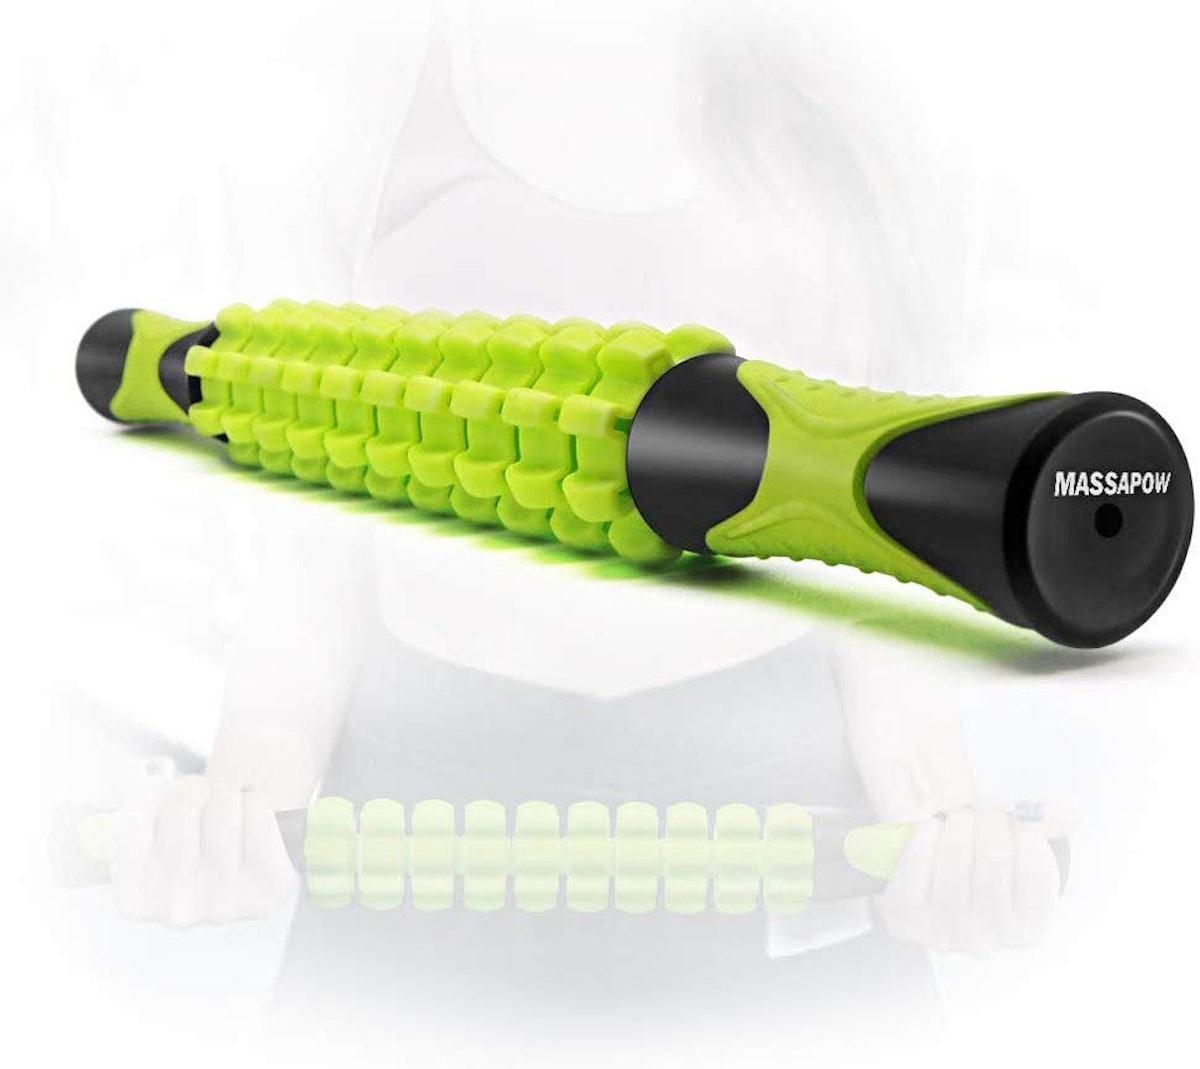 MASSAPOW Muscle Roller Stick